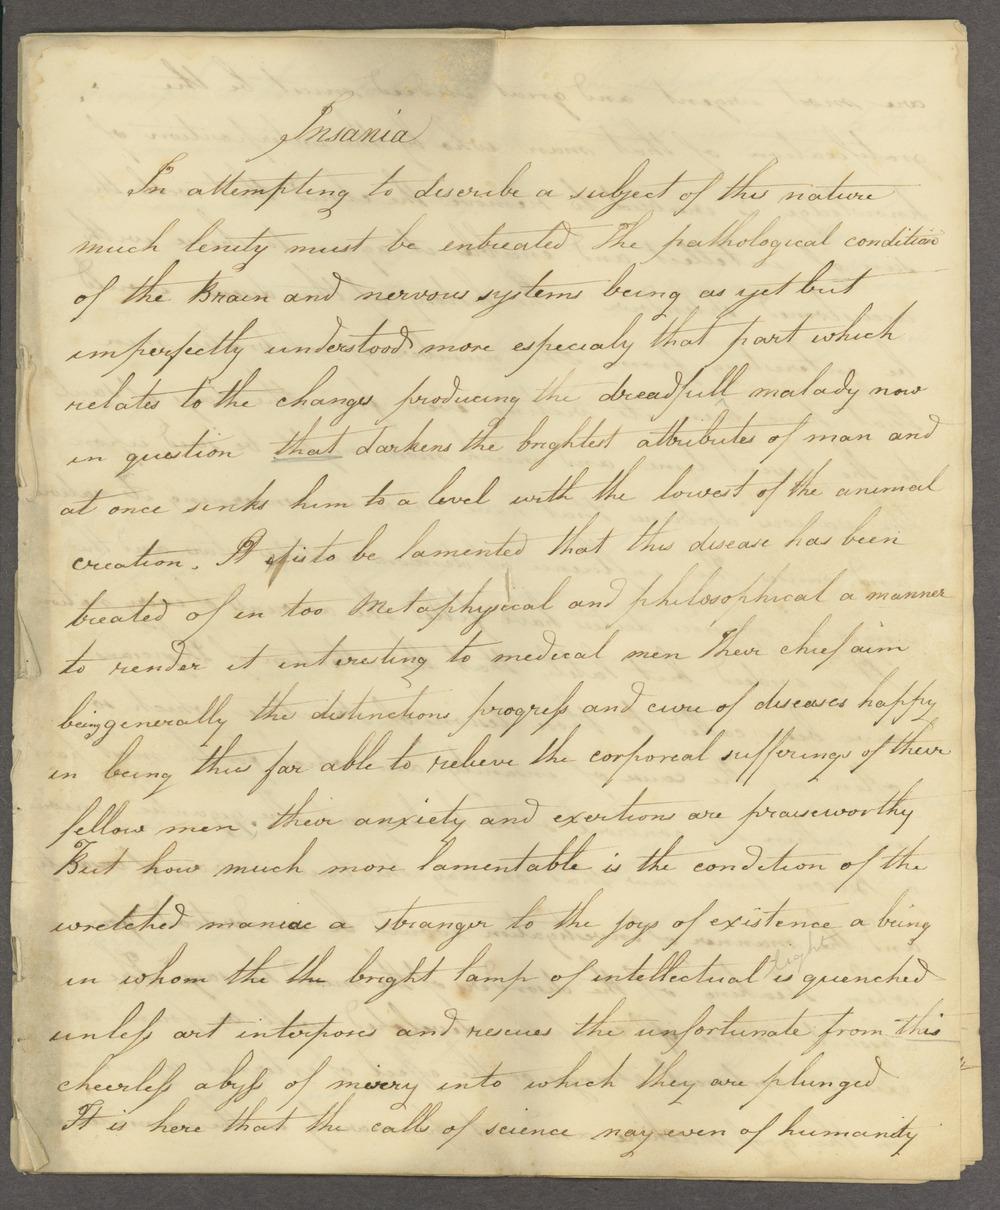 Historic Psychiatry original miscellaneous documents - 1 [Box 1 Folder 2]